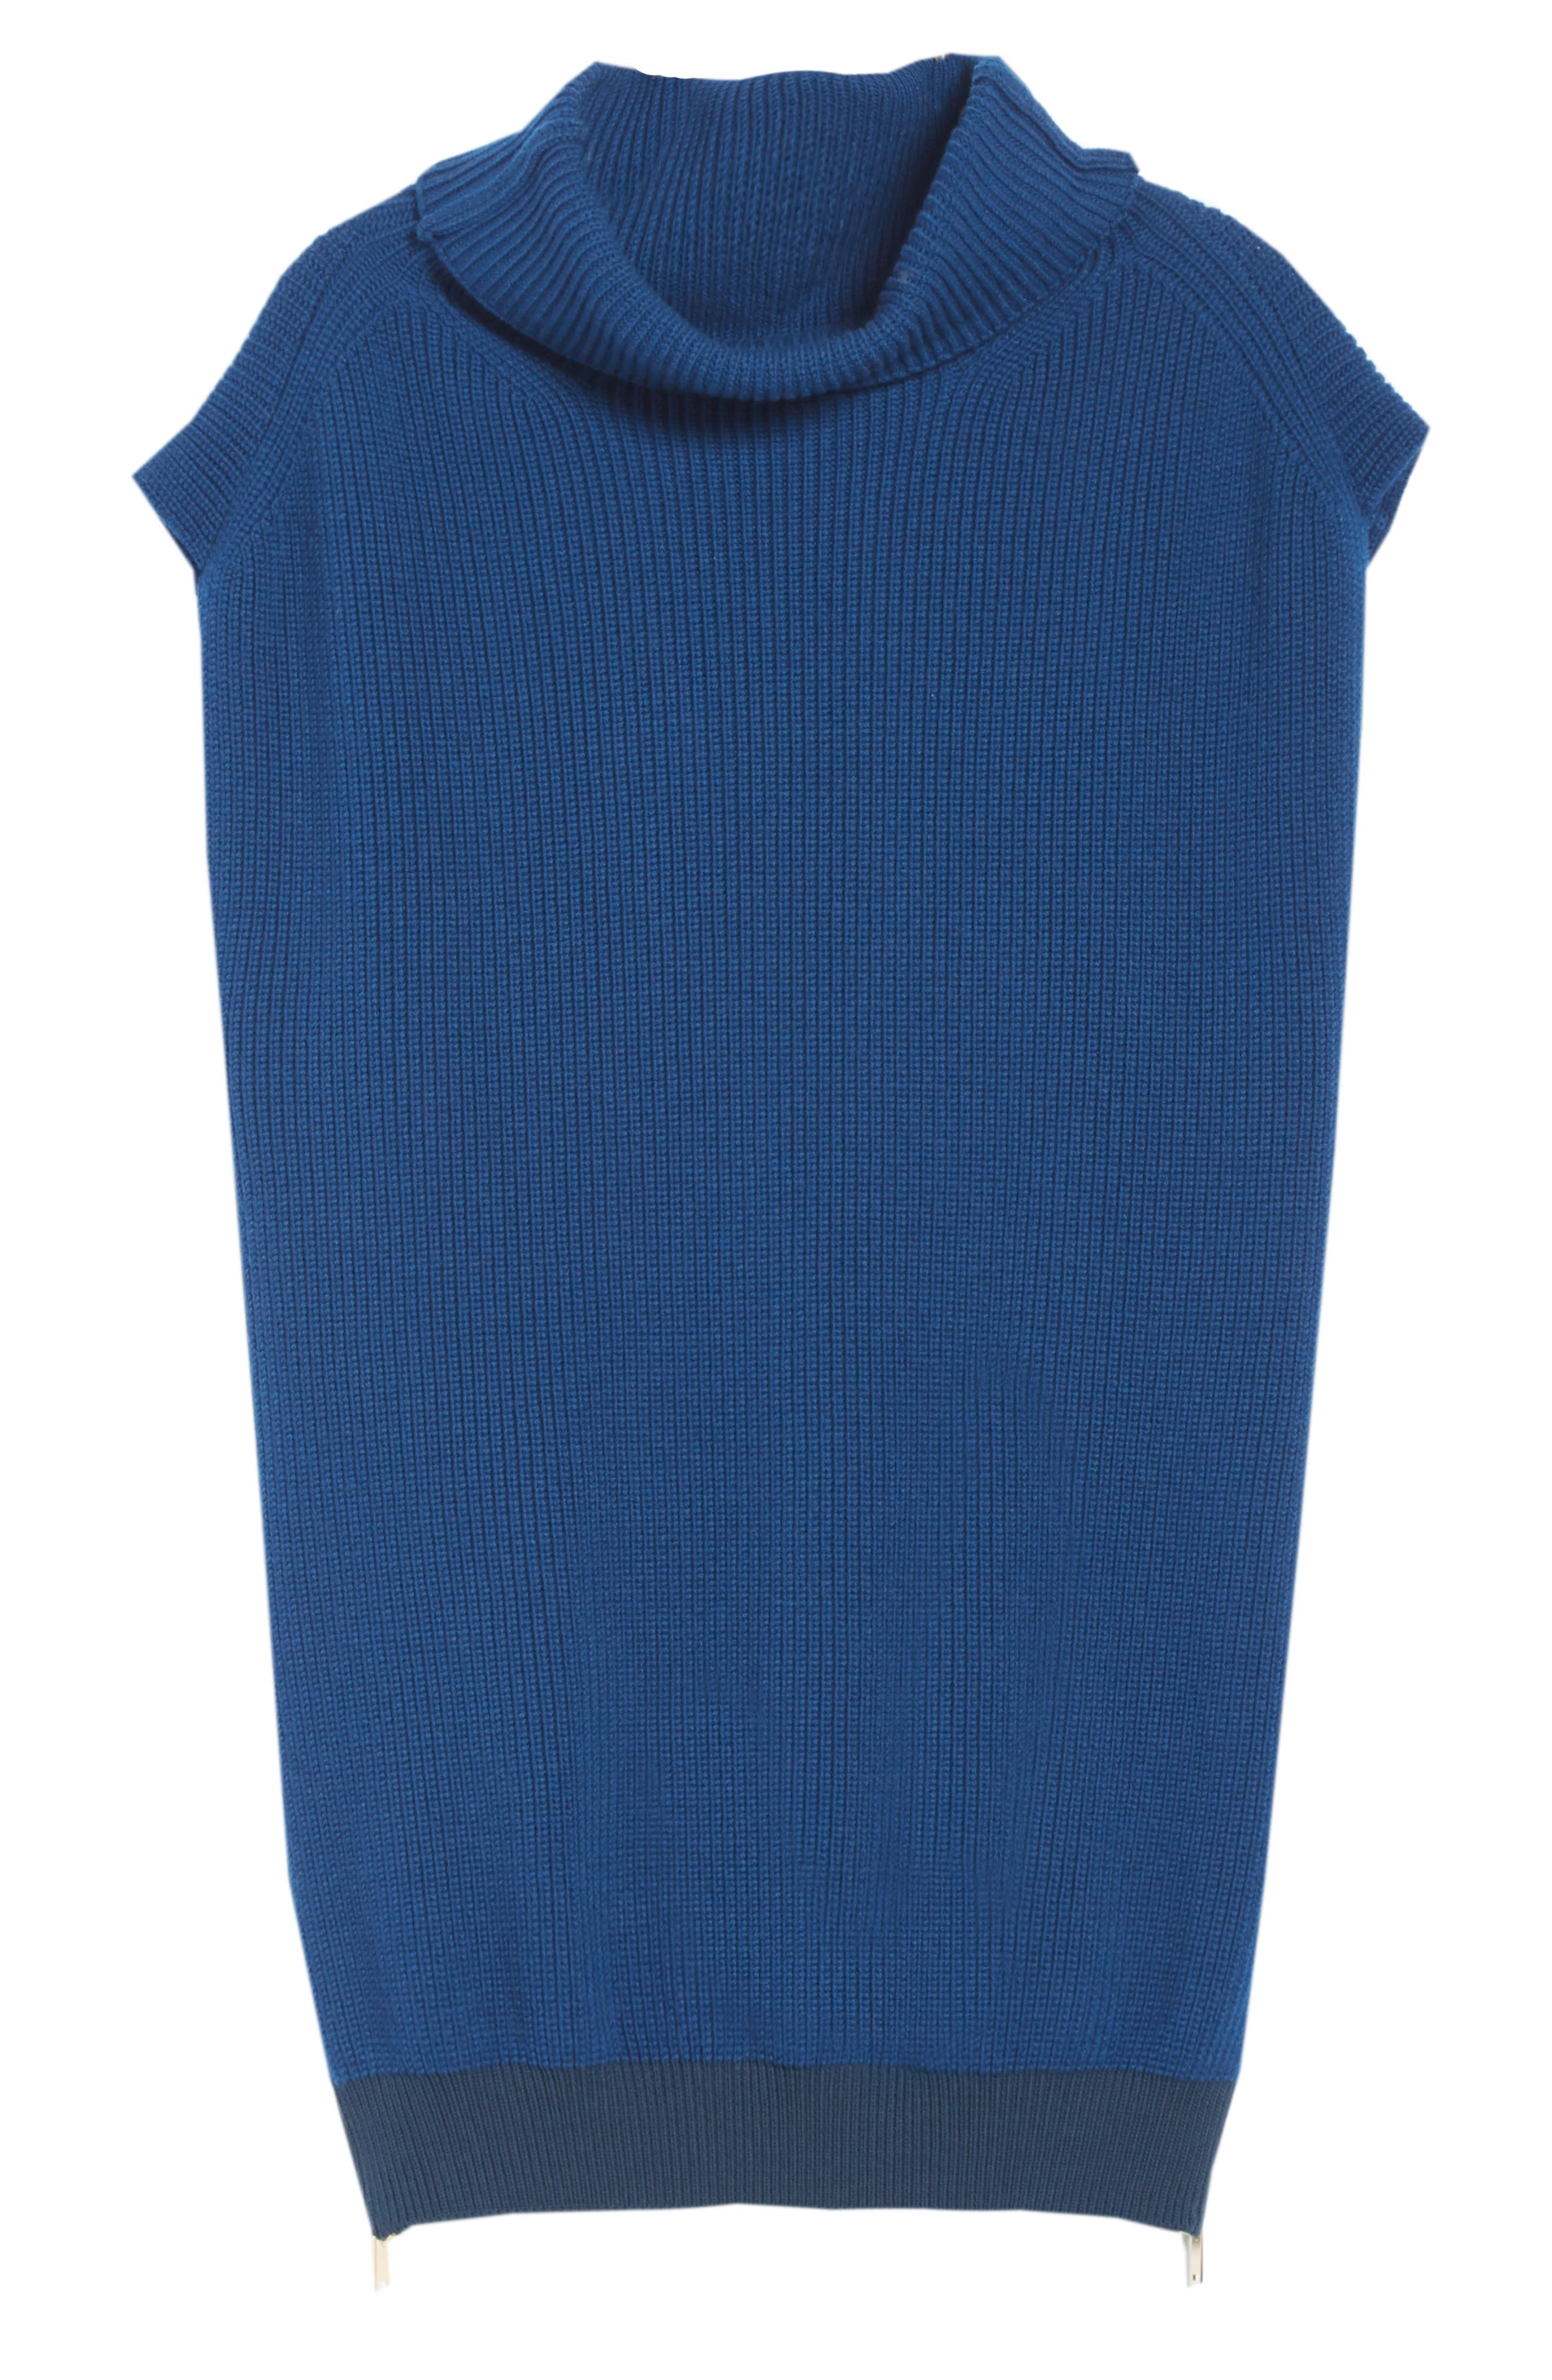 Wool Turtleneck Vest,                             Alternate thumbnail 6, color,                             SHADOW BLUE